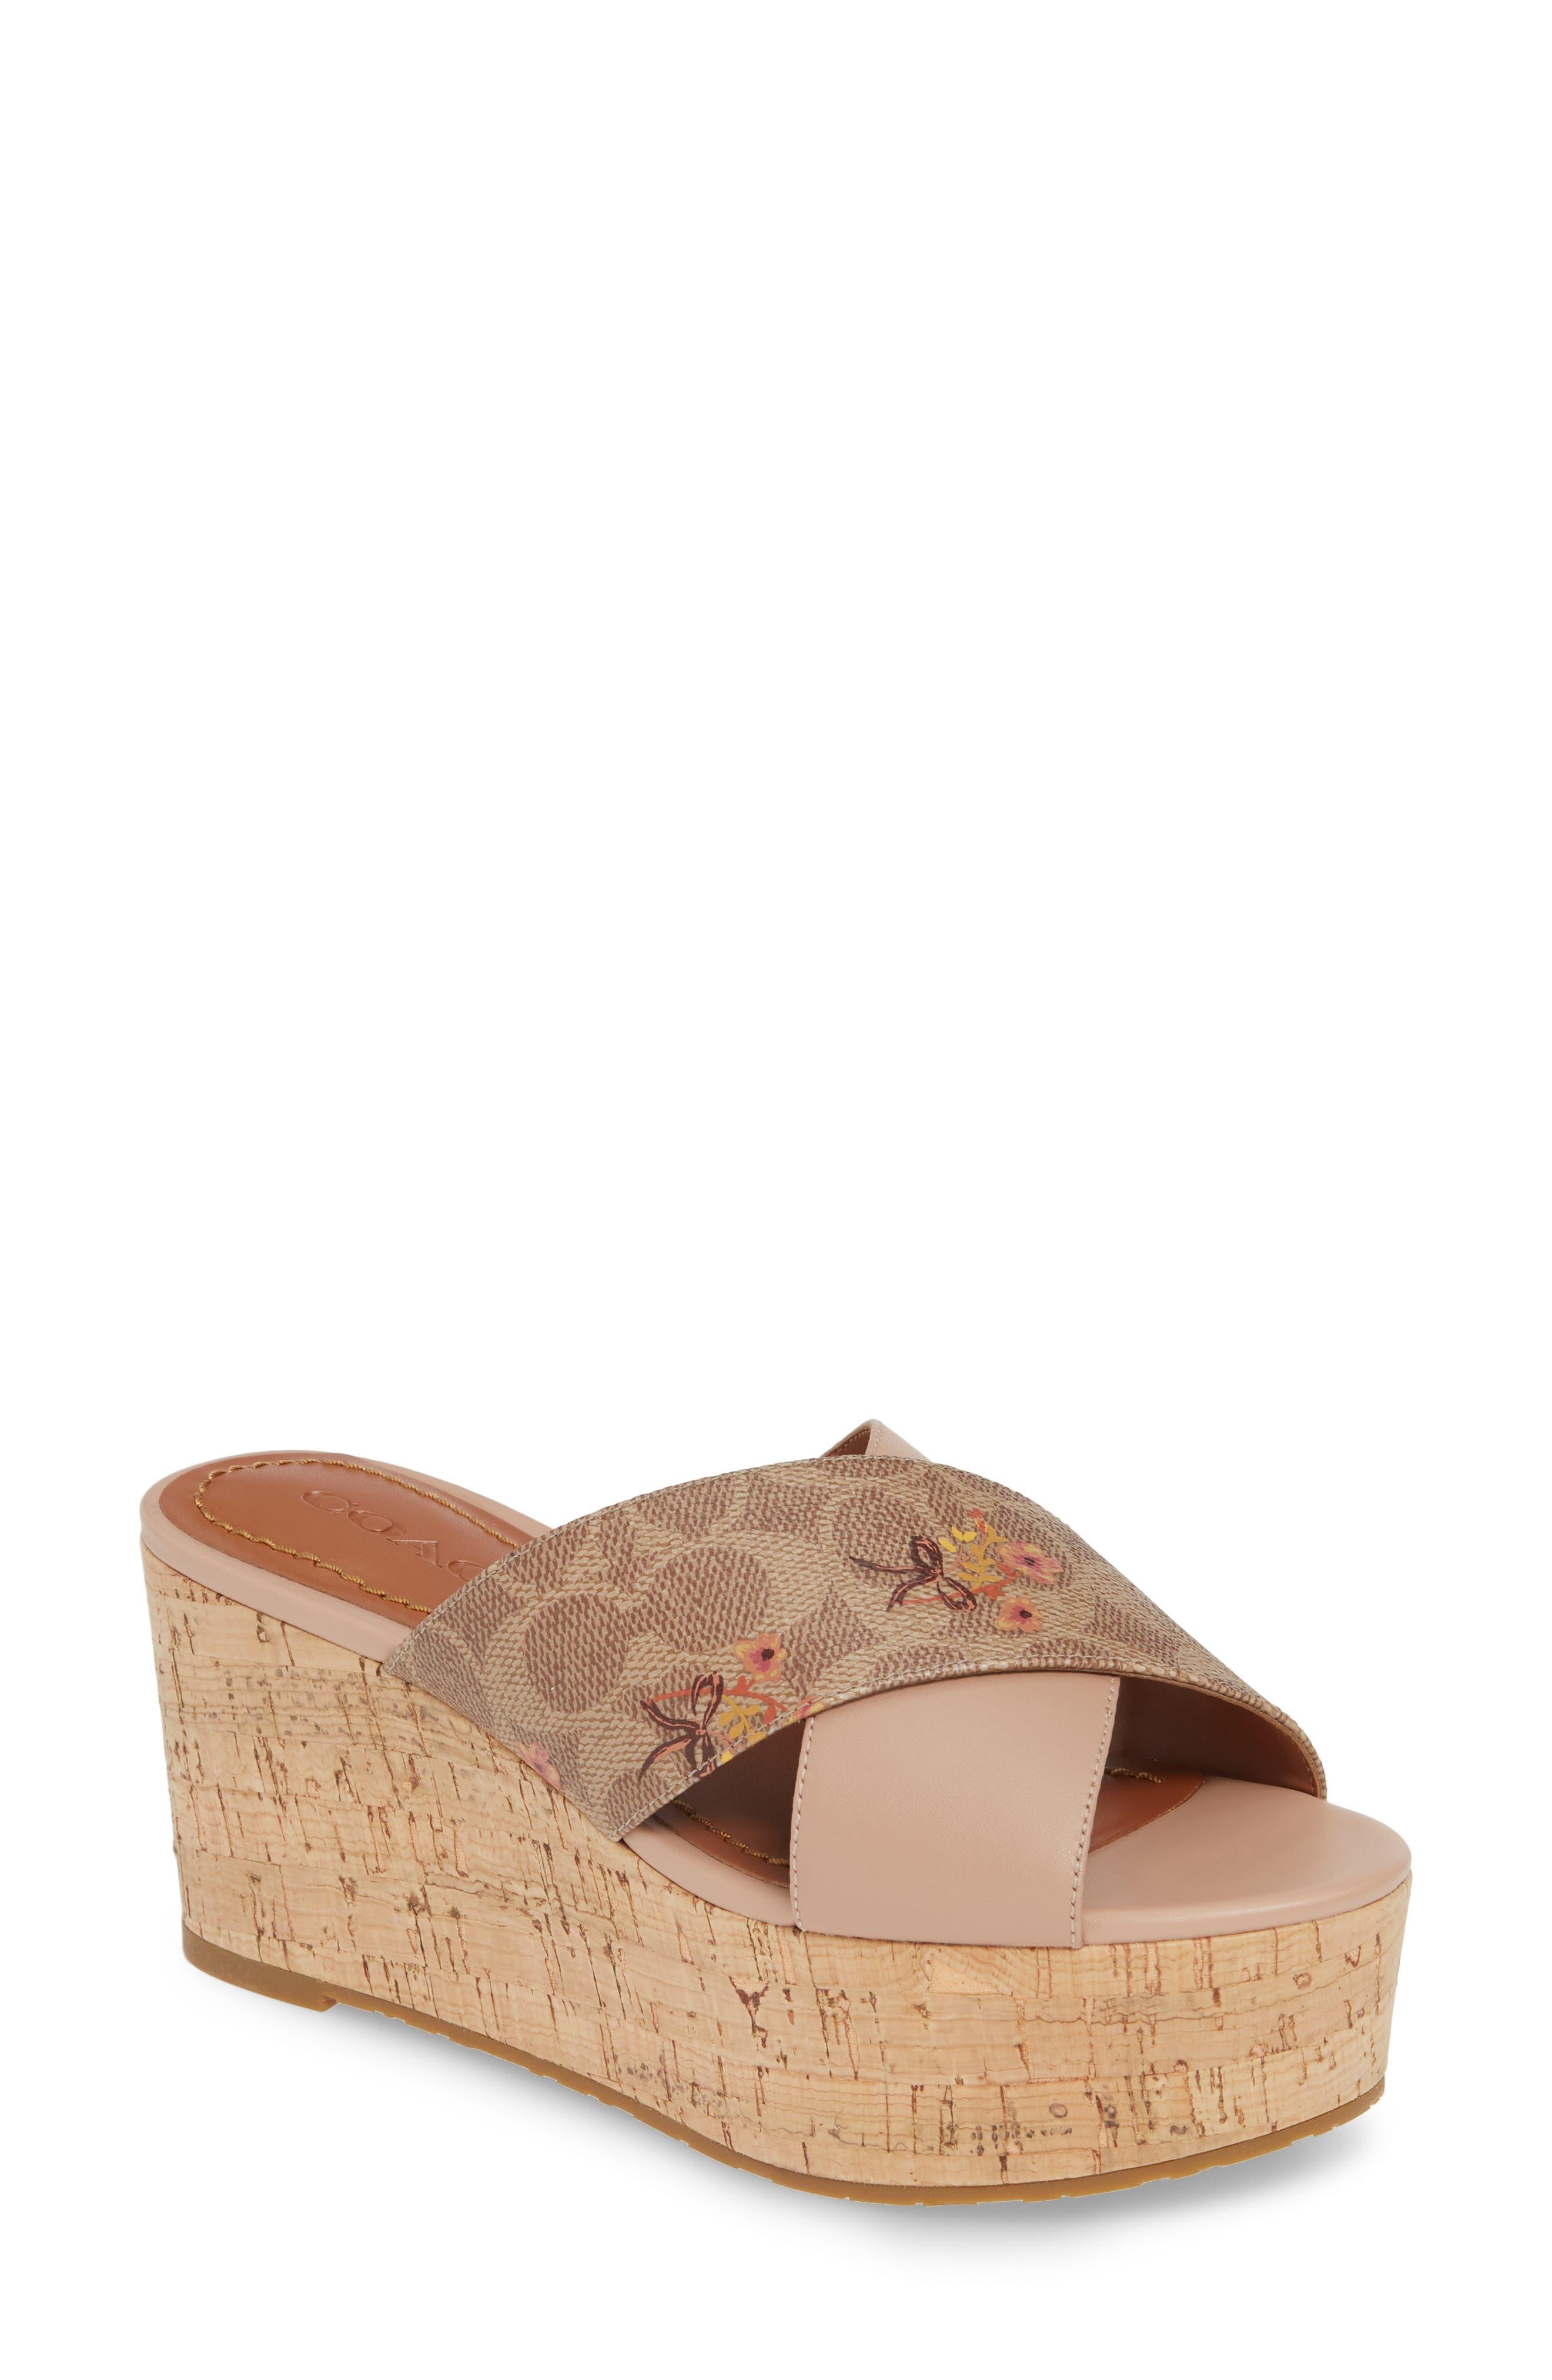 54ebe175a3 Women's COACH Sandals | Nordstrom